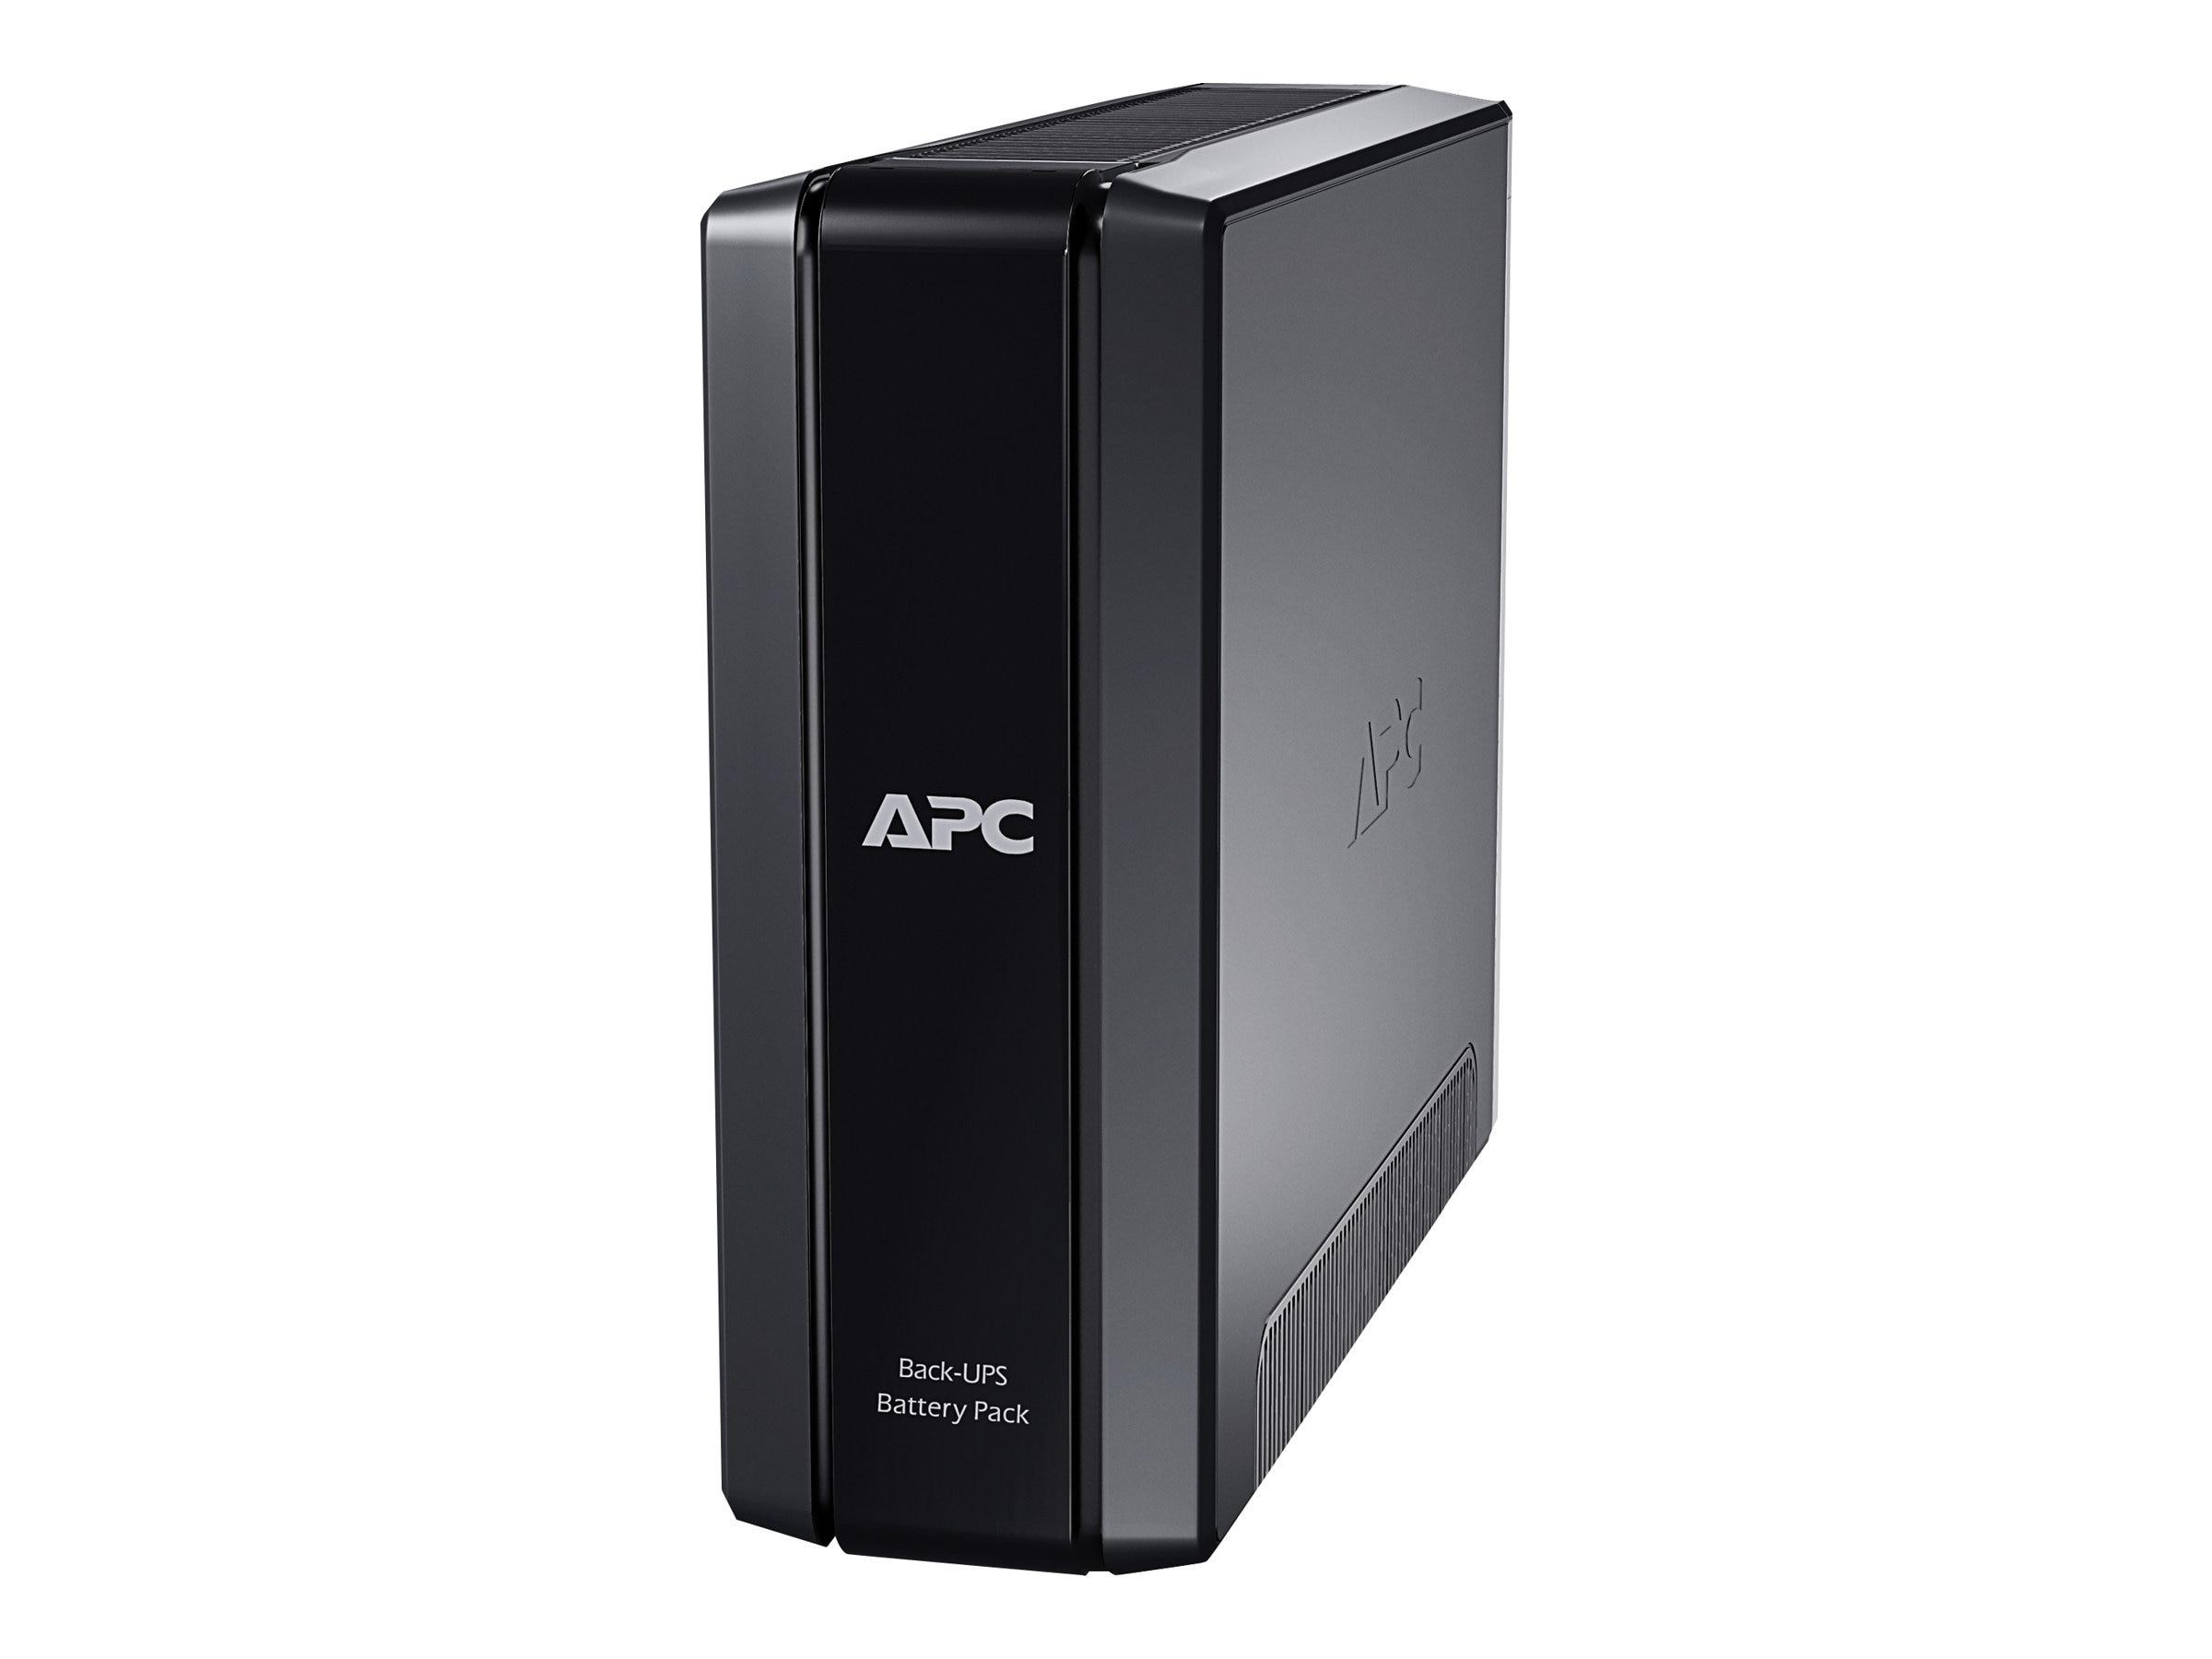 APC Back-UPS RS 24V Battery Pack, BR24BPG, 12085961, Batteries - UPS